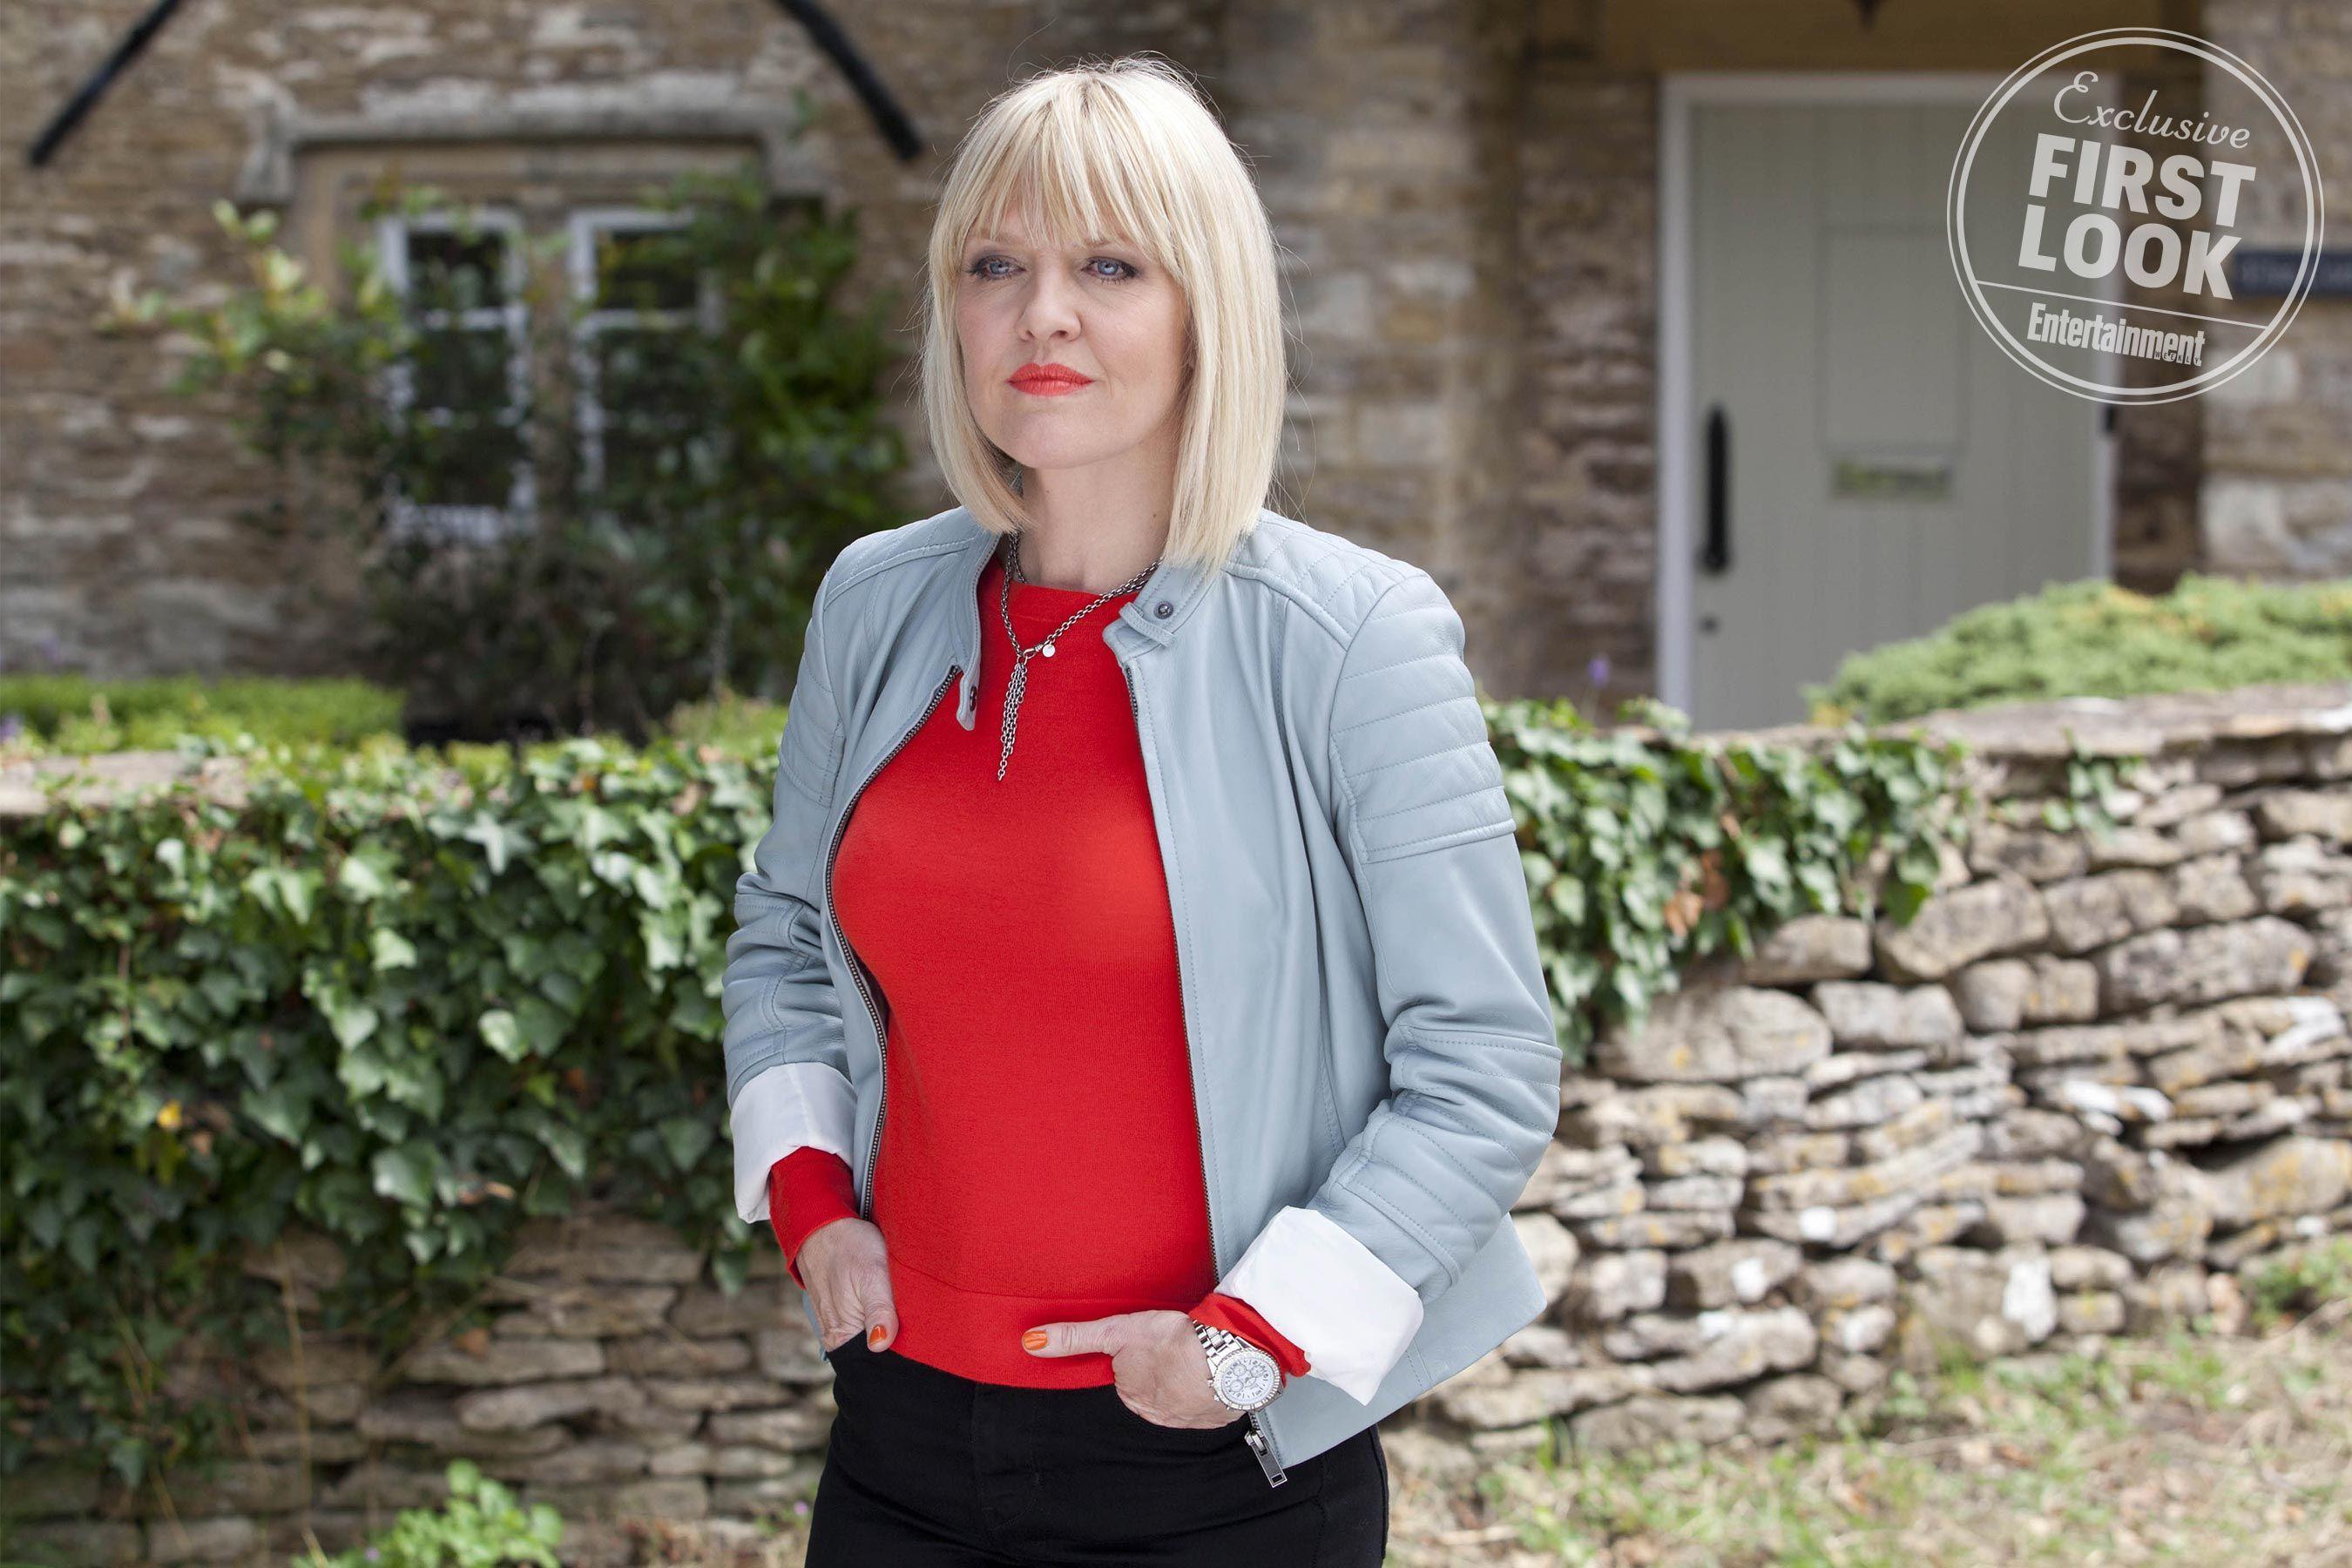 Agatha Raisin Exclusive First Look At Season 2 Of British